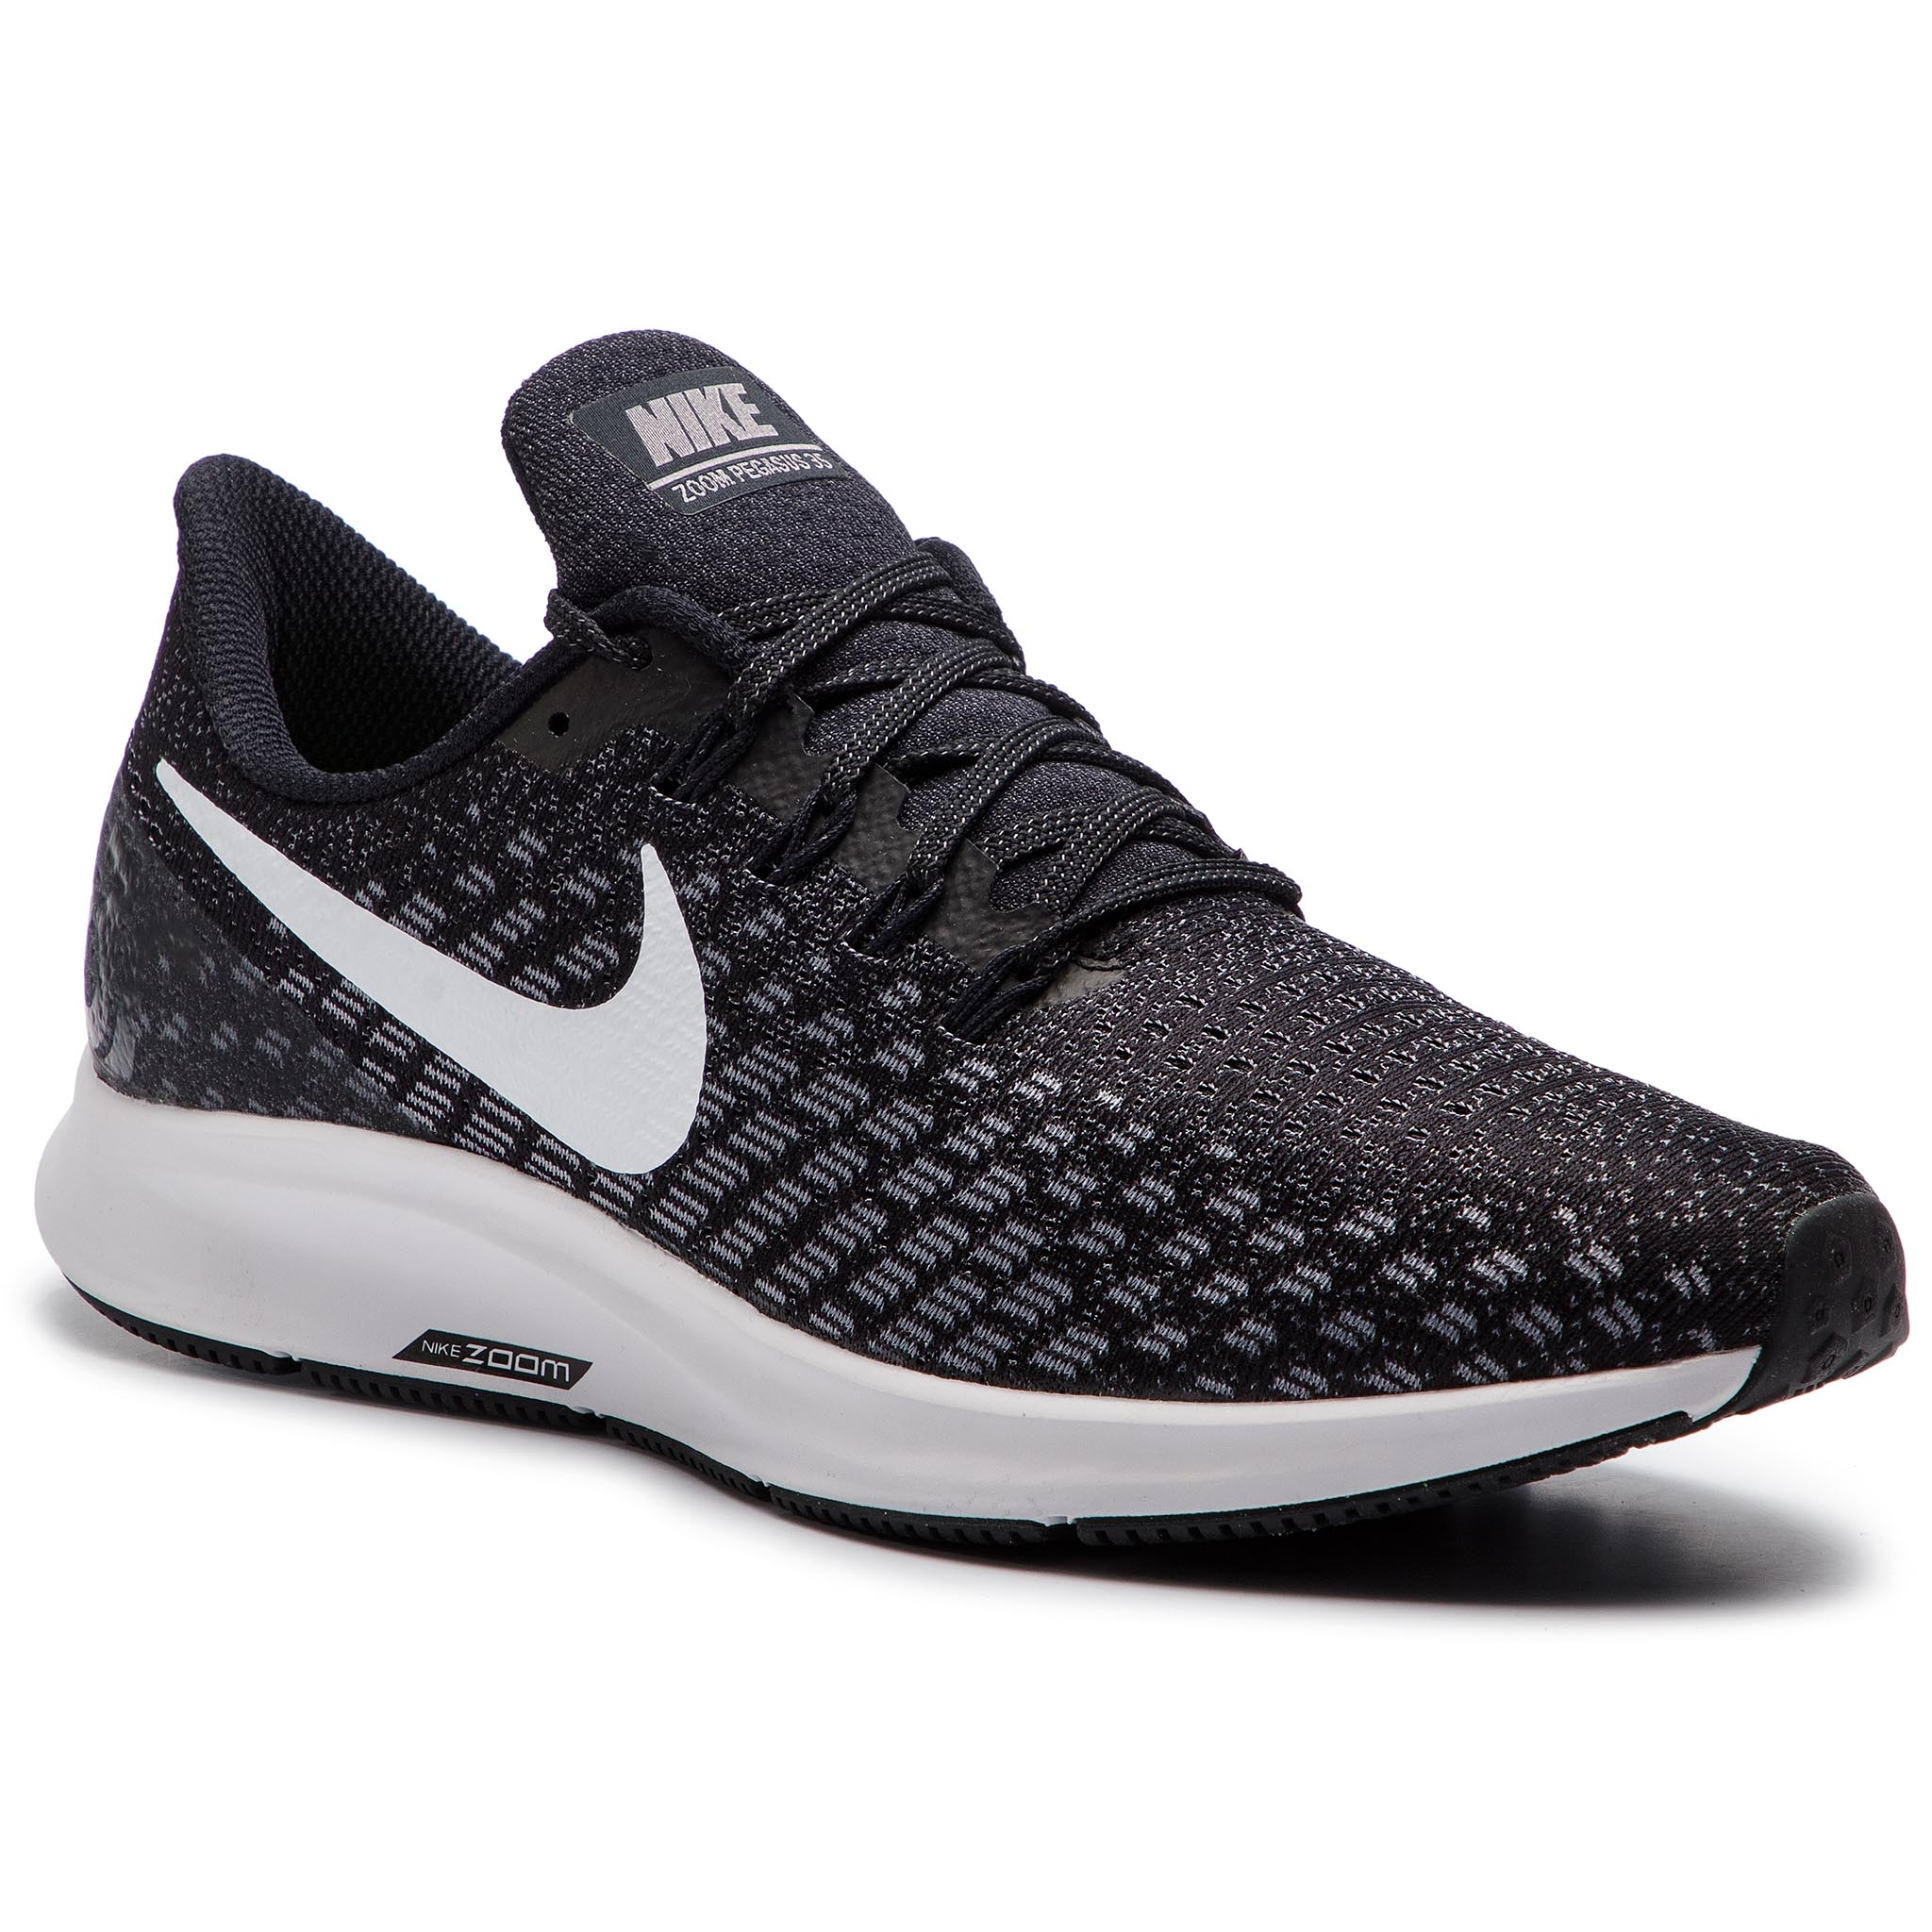 9c4c0362d151 Shoes NIKE Air Zoom Pegasus 35 942851 001 Black White Gunsmoke Oil Grey